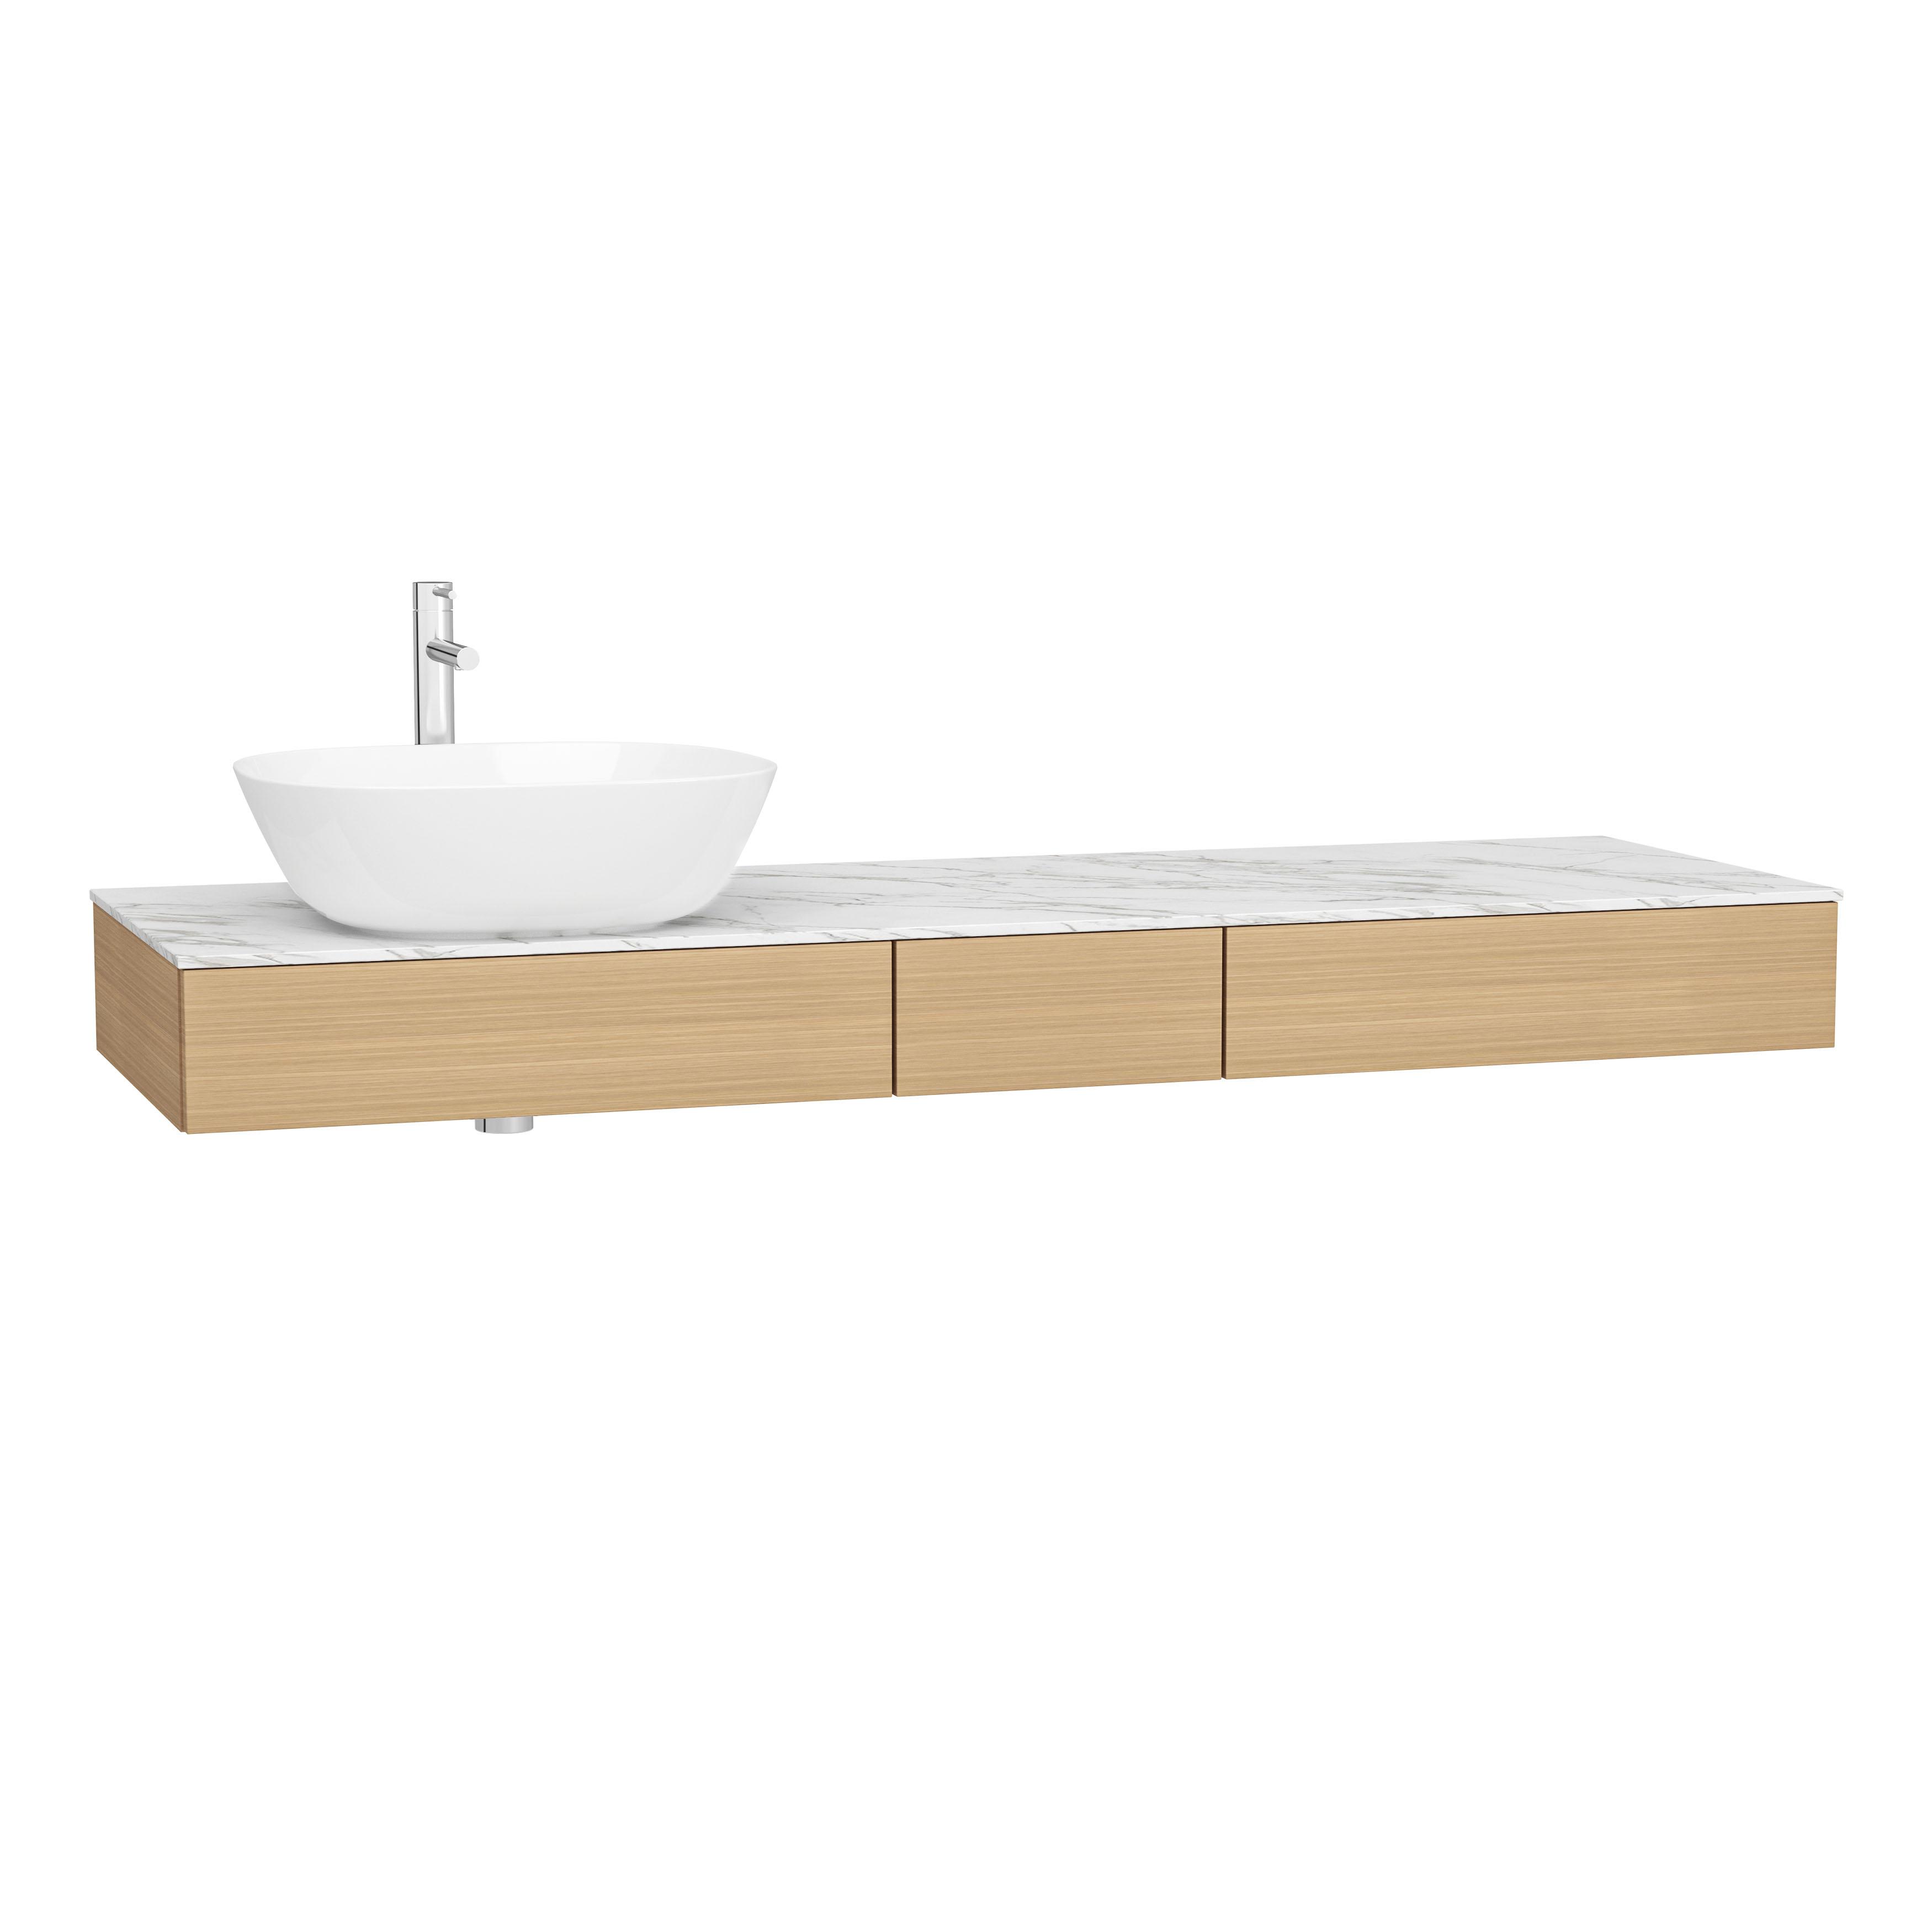 Origin plan de toilette avec tiroir, 150 cm, chêne ferrera, gauche